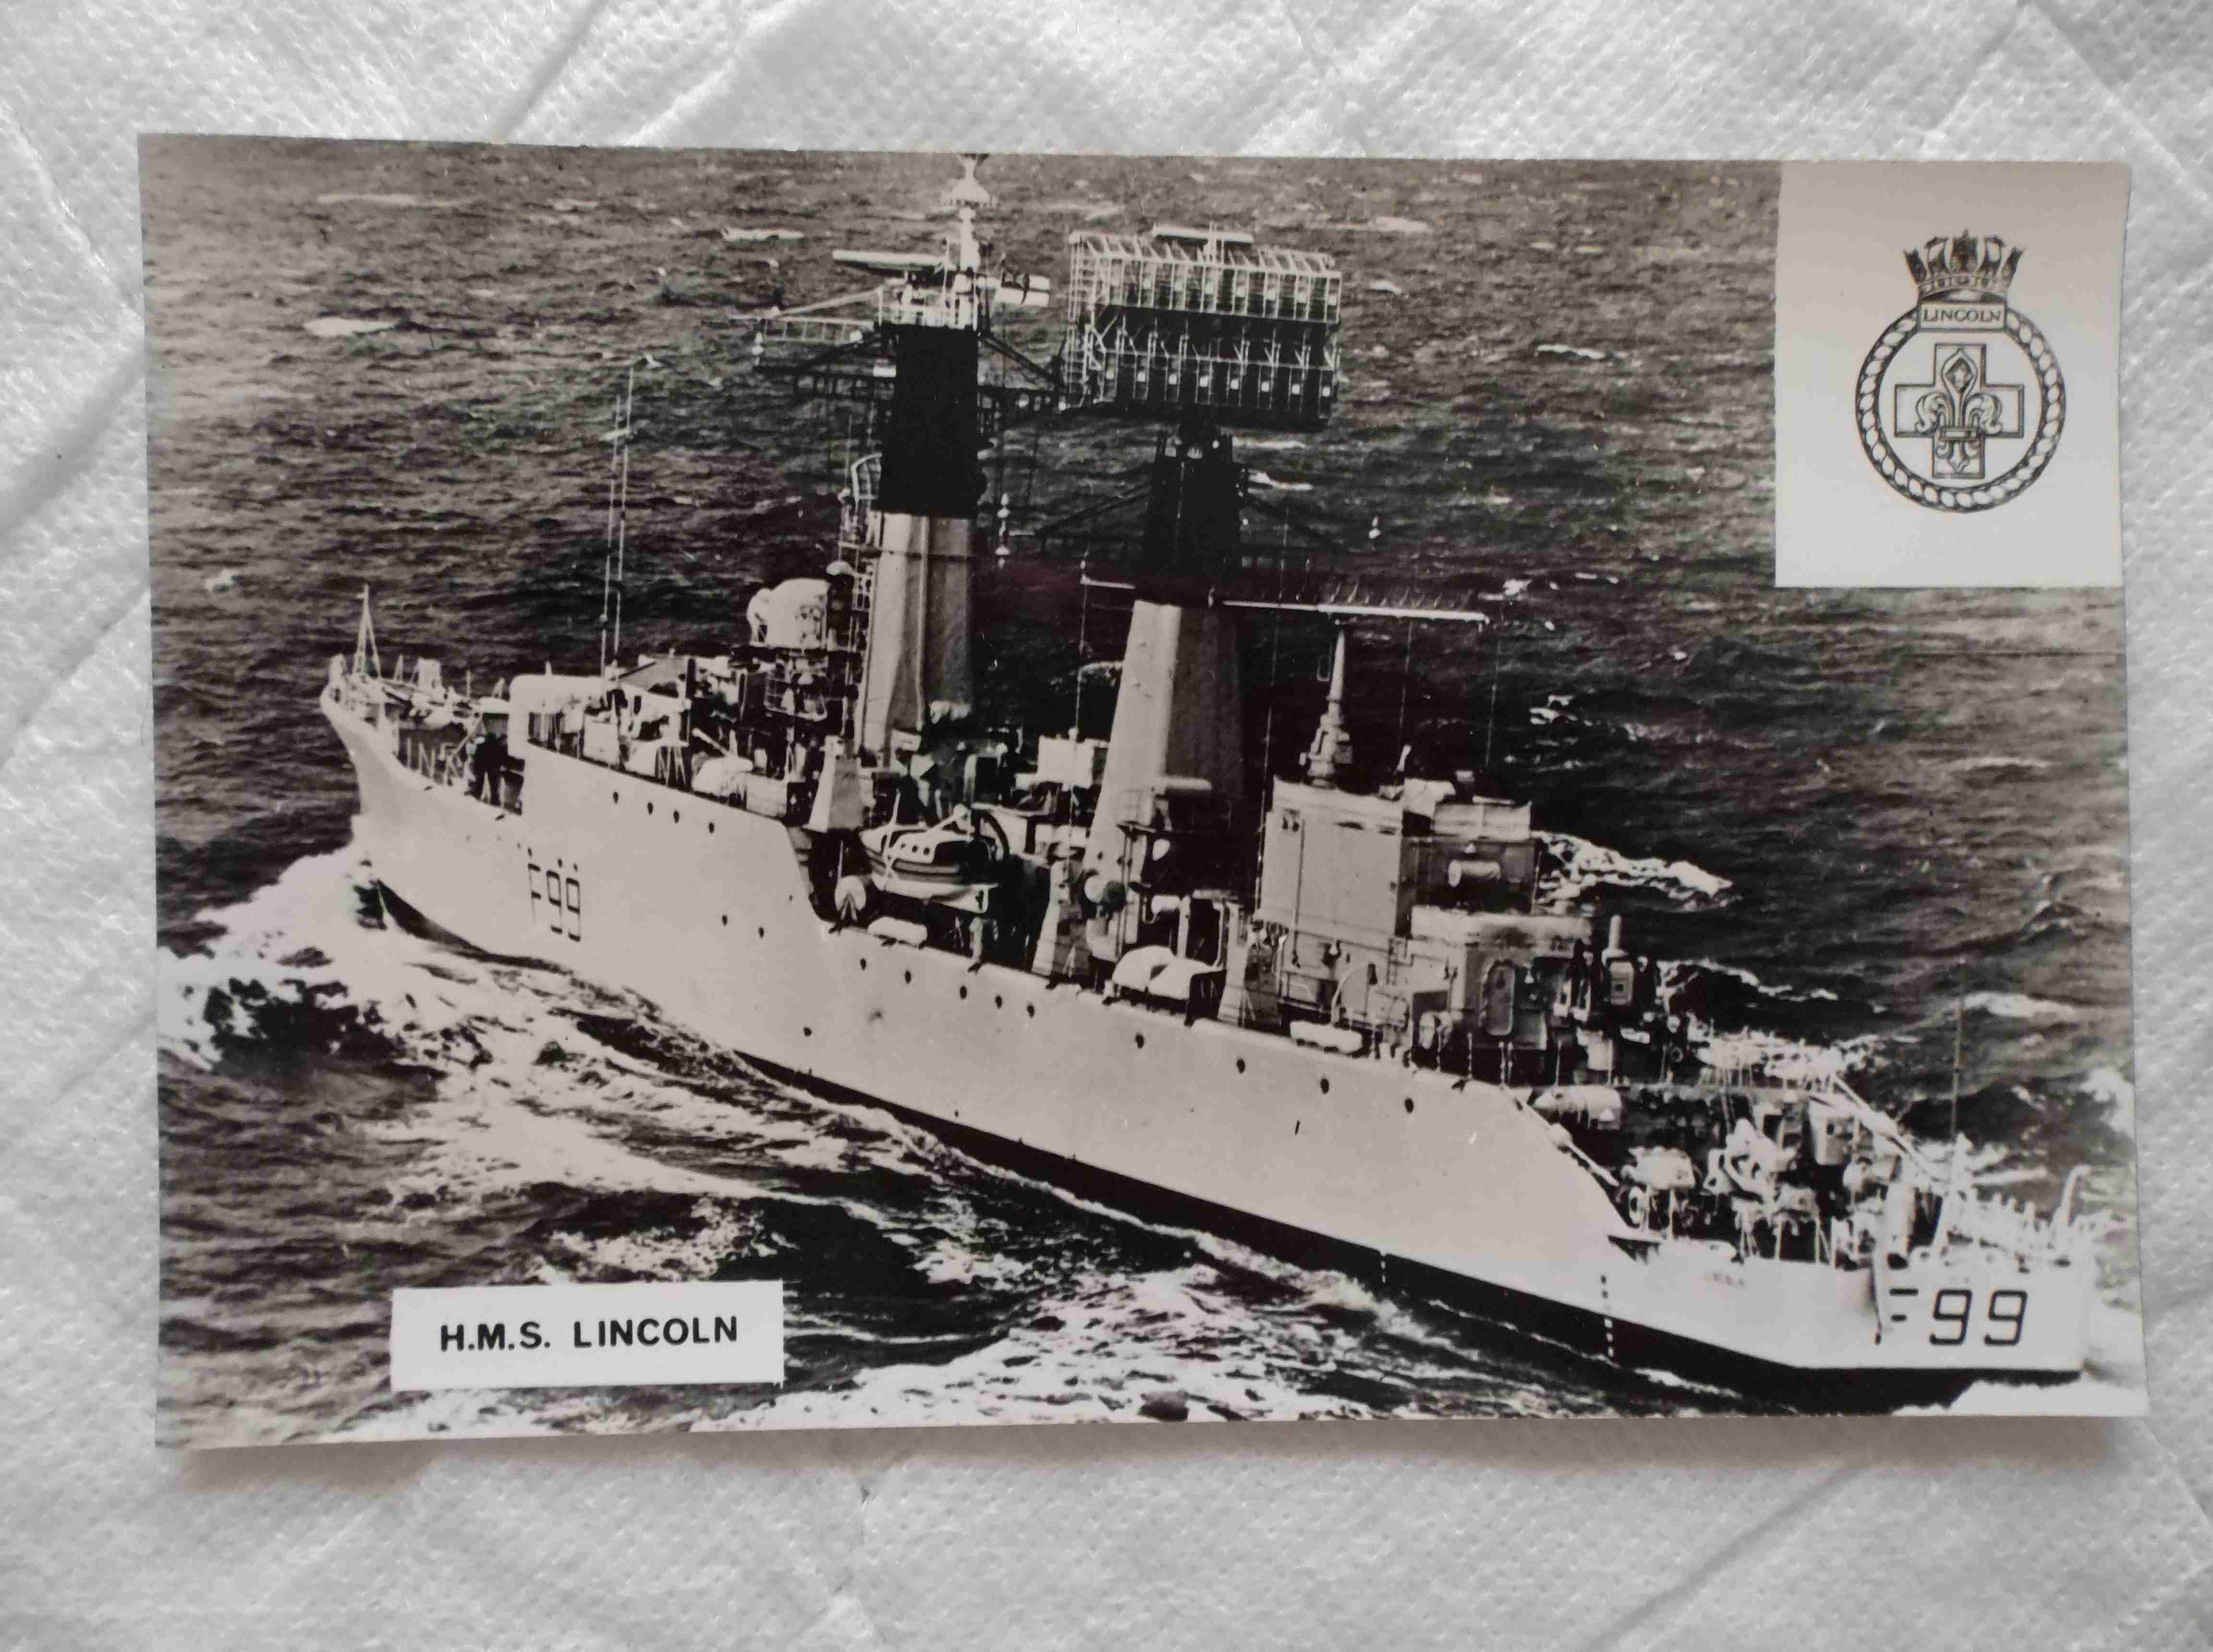 POSTCARD OF THE ROYAL NAVAL VESSEL HMS LINCOLN